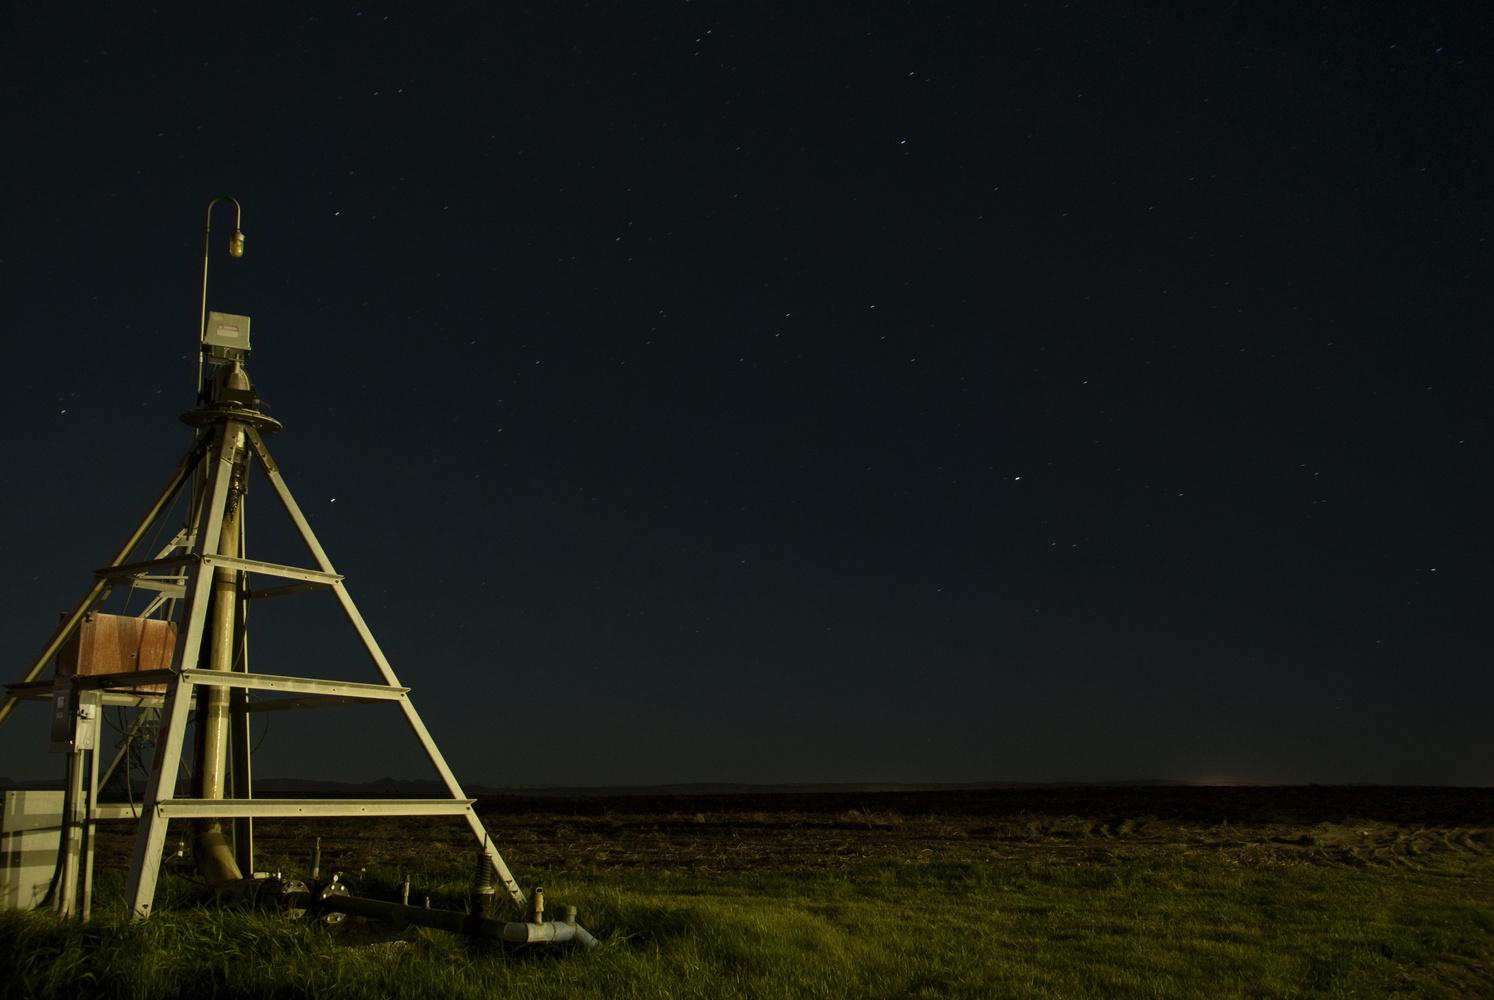 Night farm by Ronald McIntyre